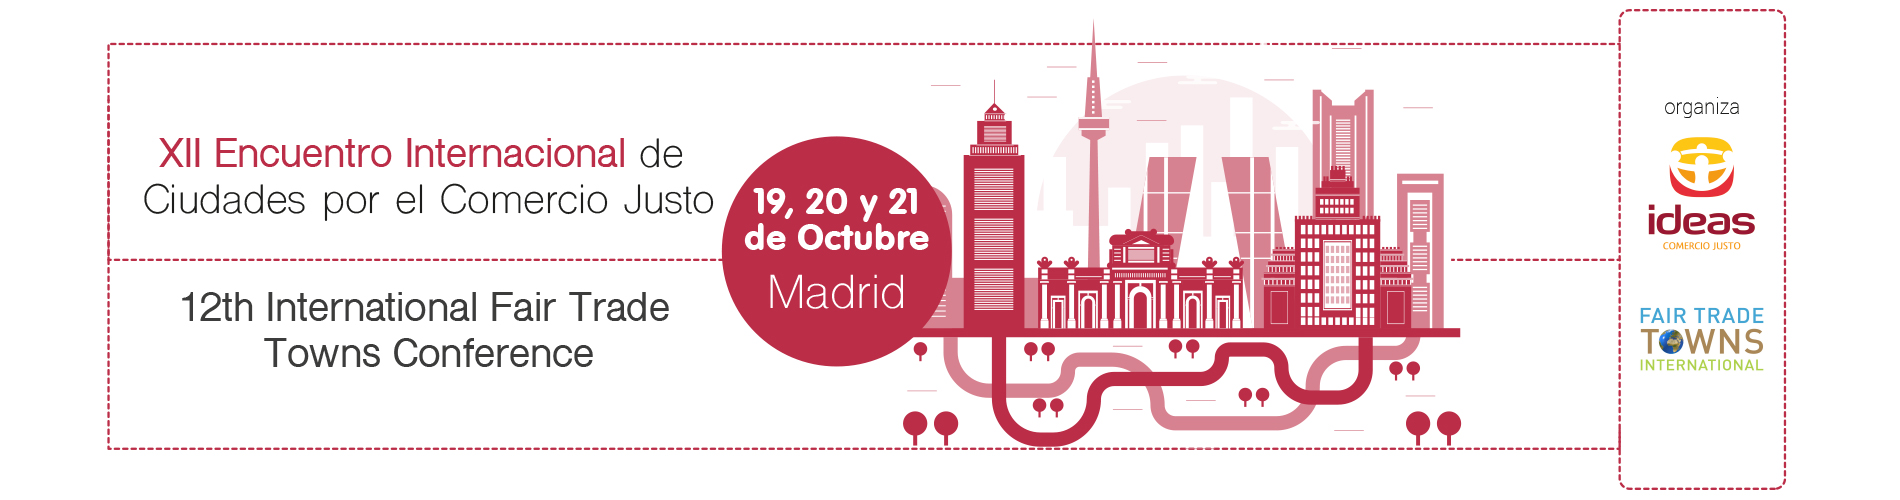 Konferencja Faiir Trade Towns Madryt